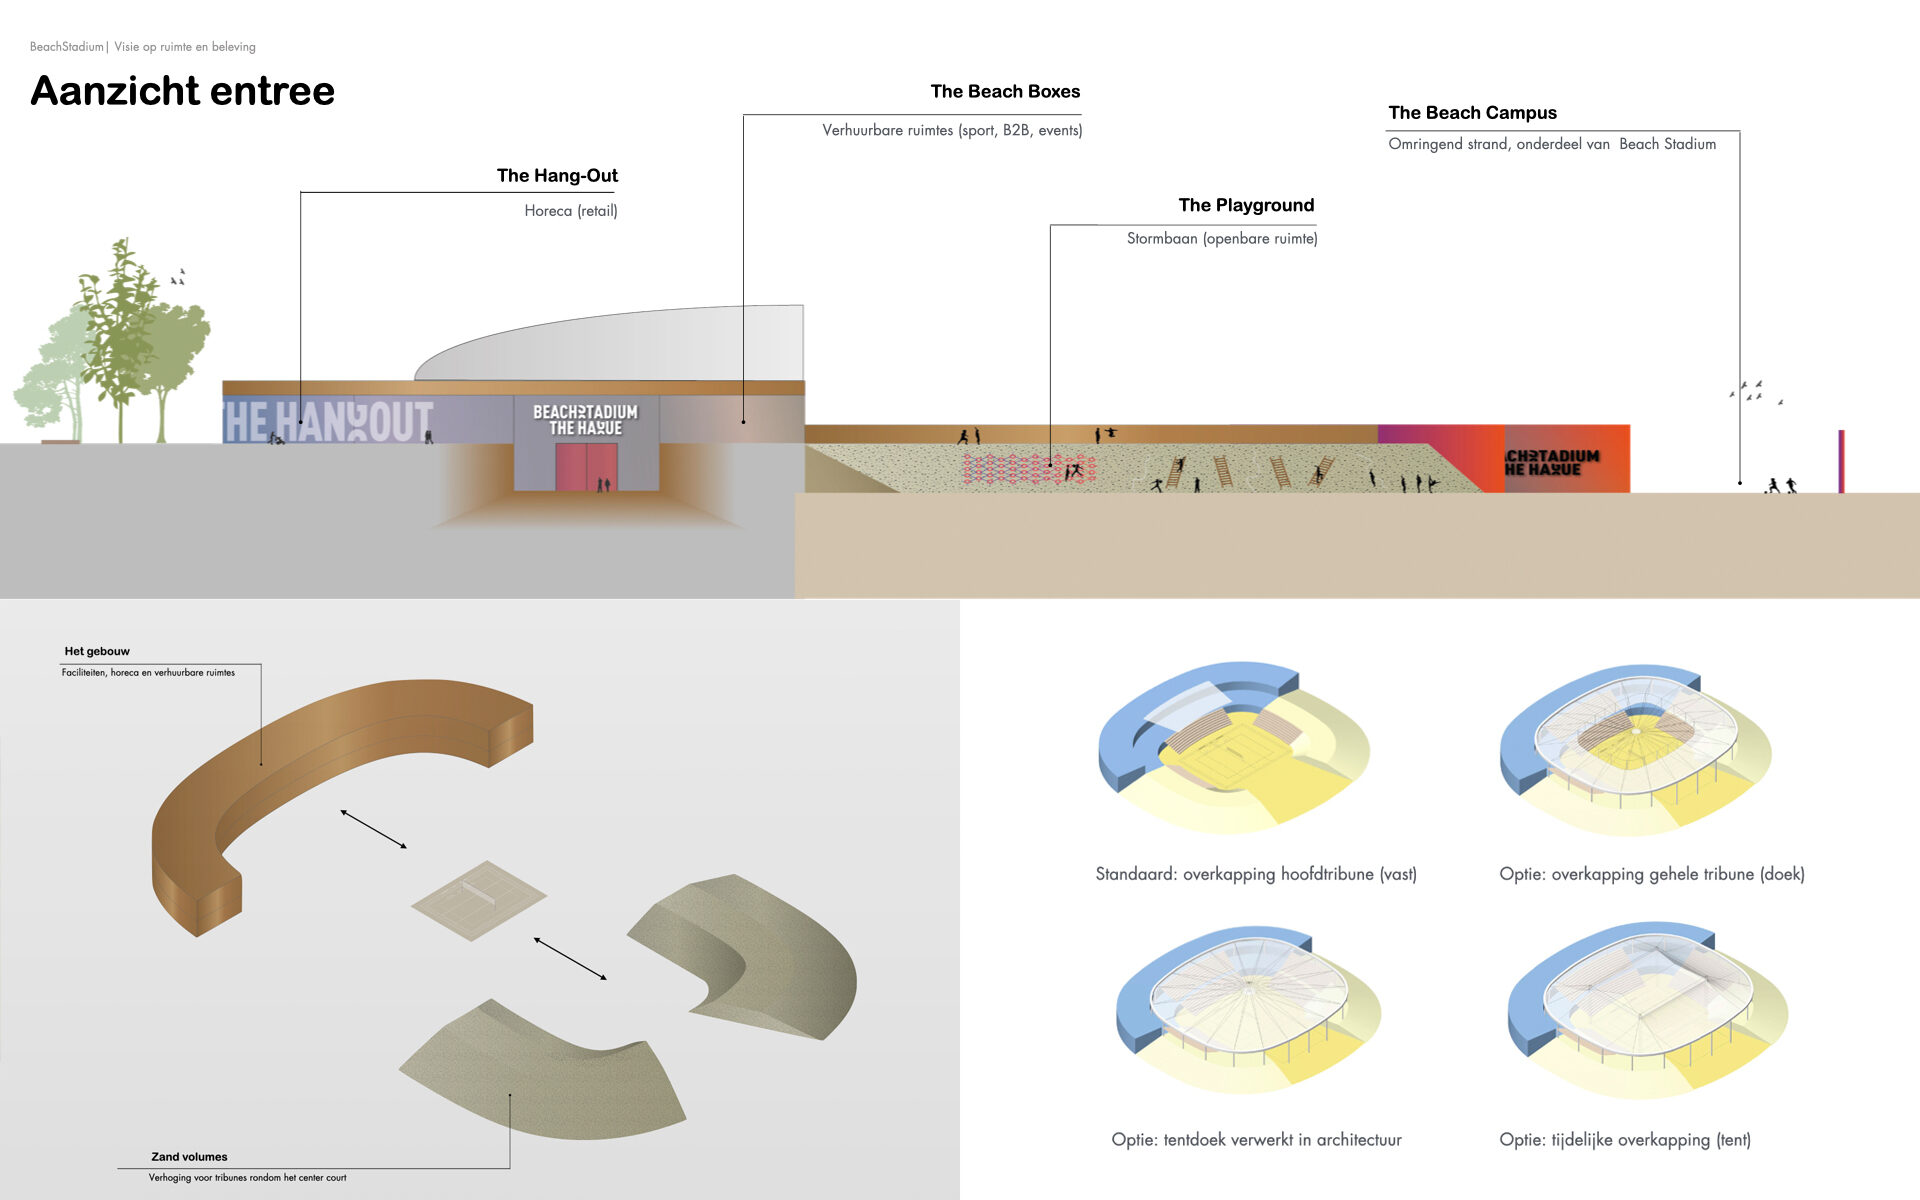 Beach Stadium Den Haag DAY Creative Strategic Consultancy Experience Concepts Brand Design Architecture